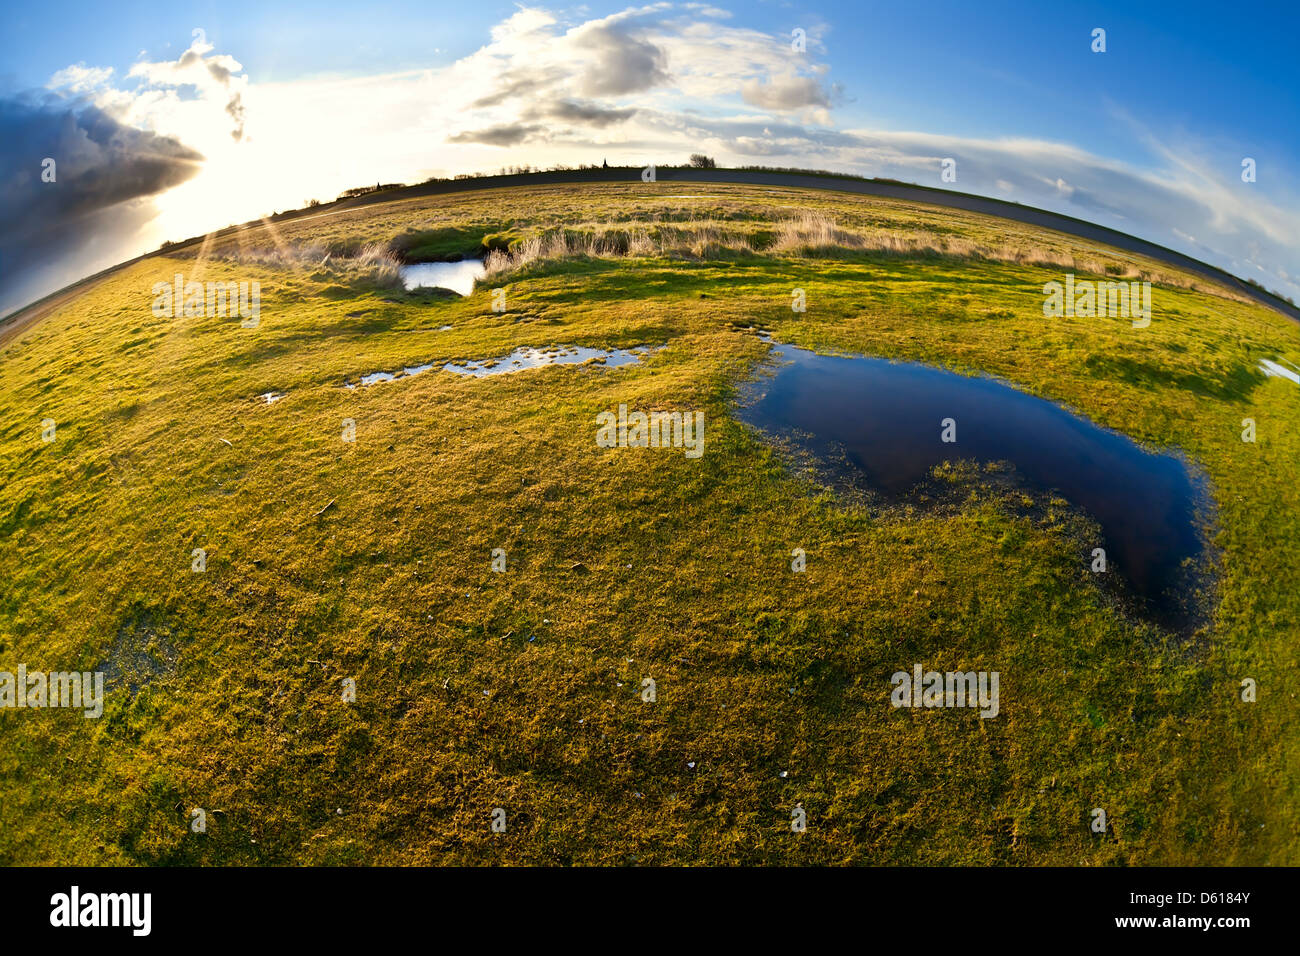 pond, pasture and sun via fisheye view - Stock Image